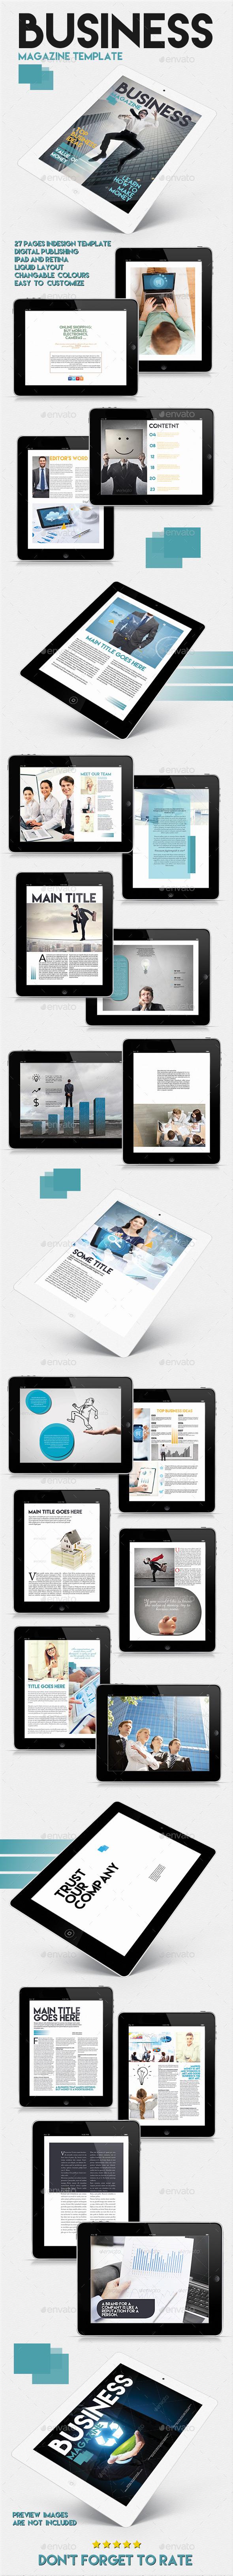 Tablet Business Magazine Template Issue Two - Digital Magazines ePublishing